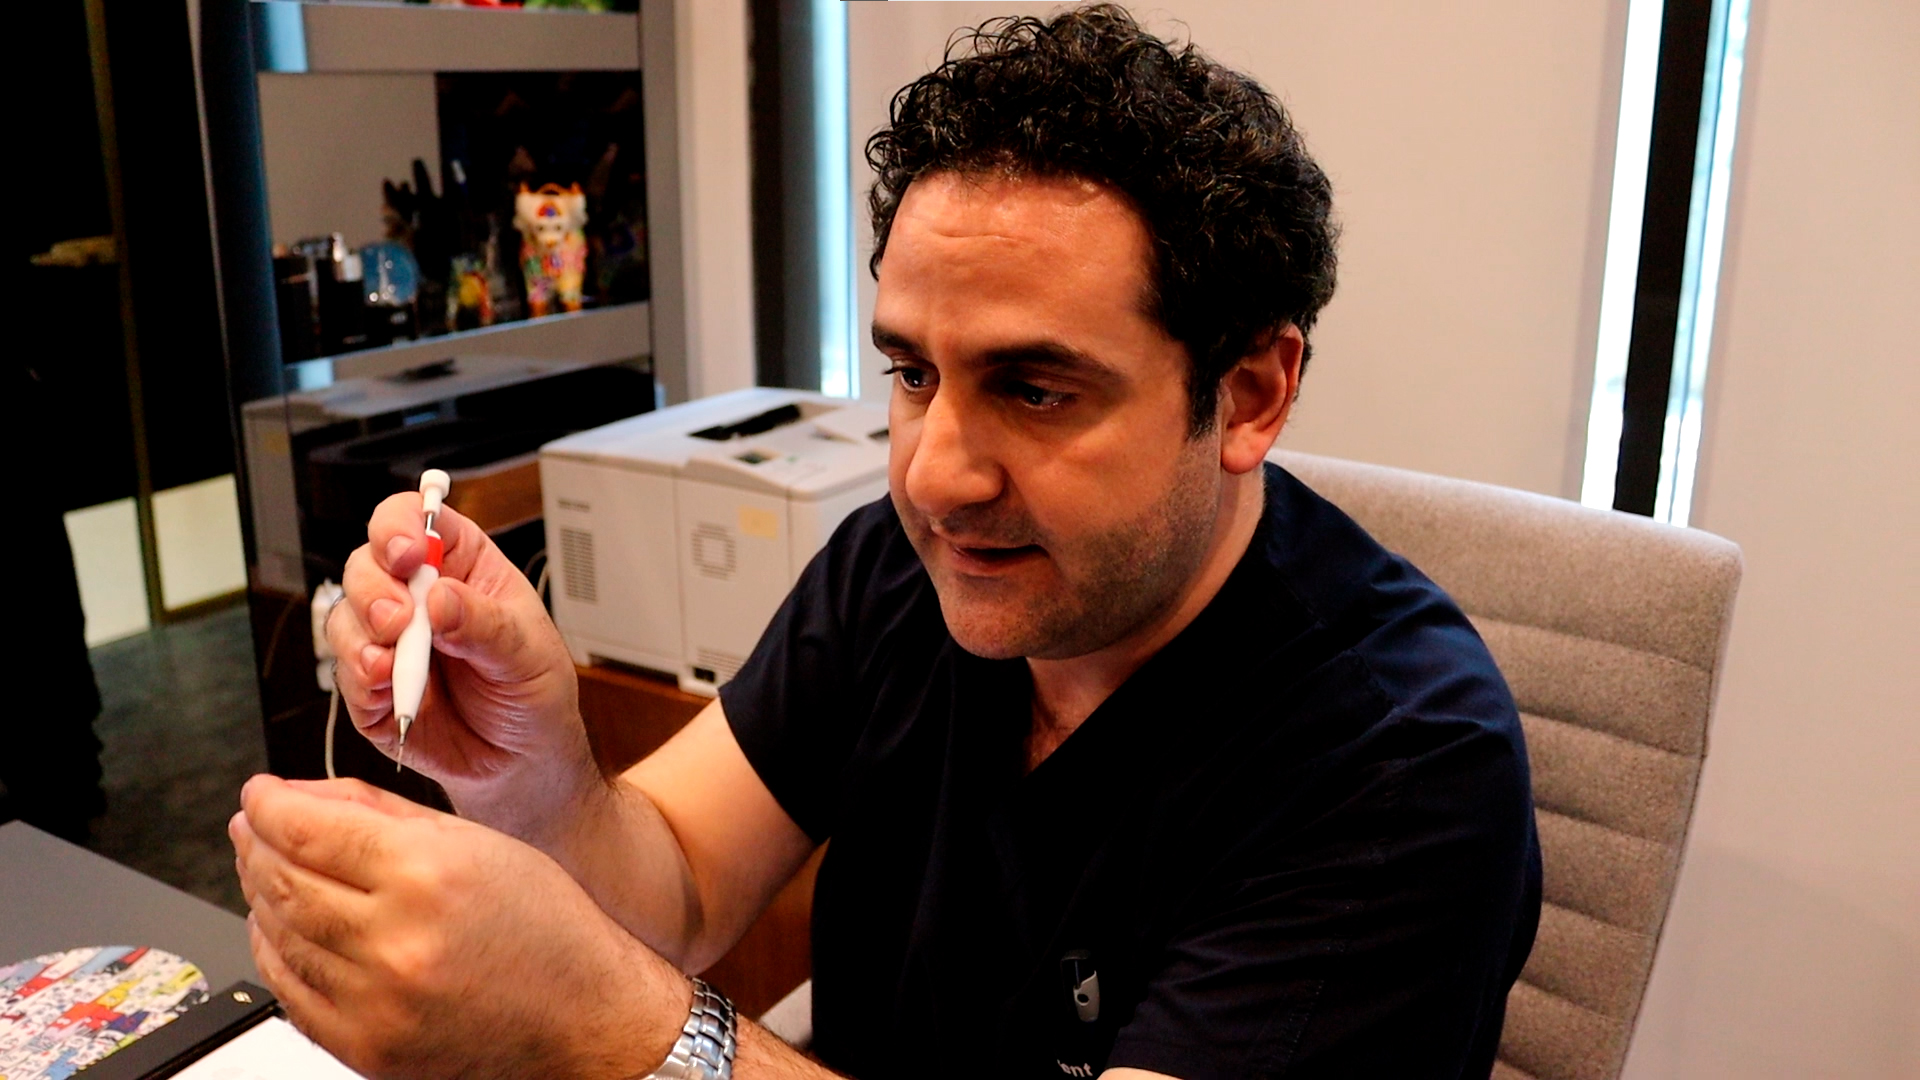 Implanter Dr. Acar